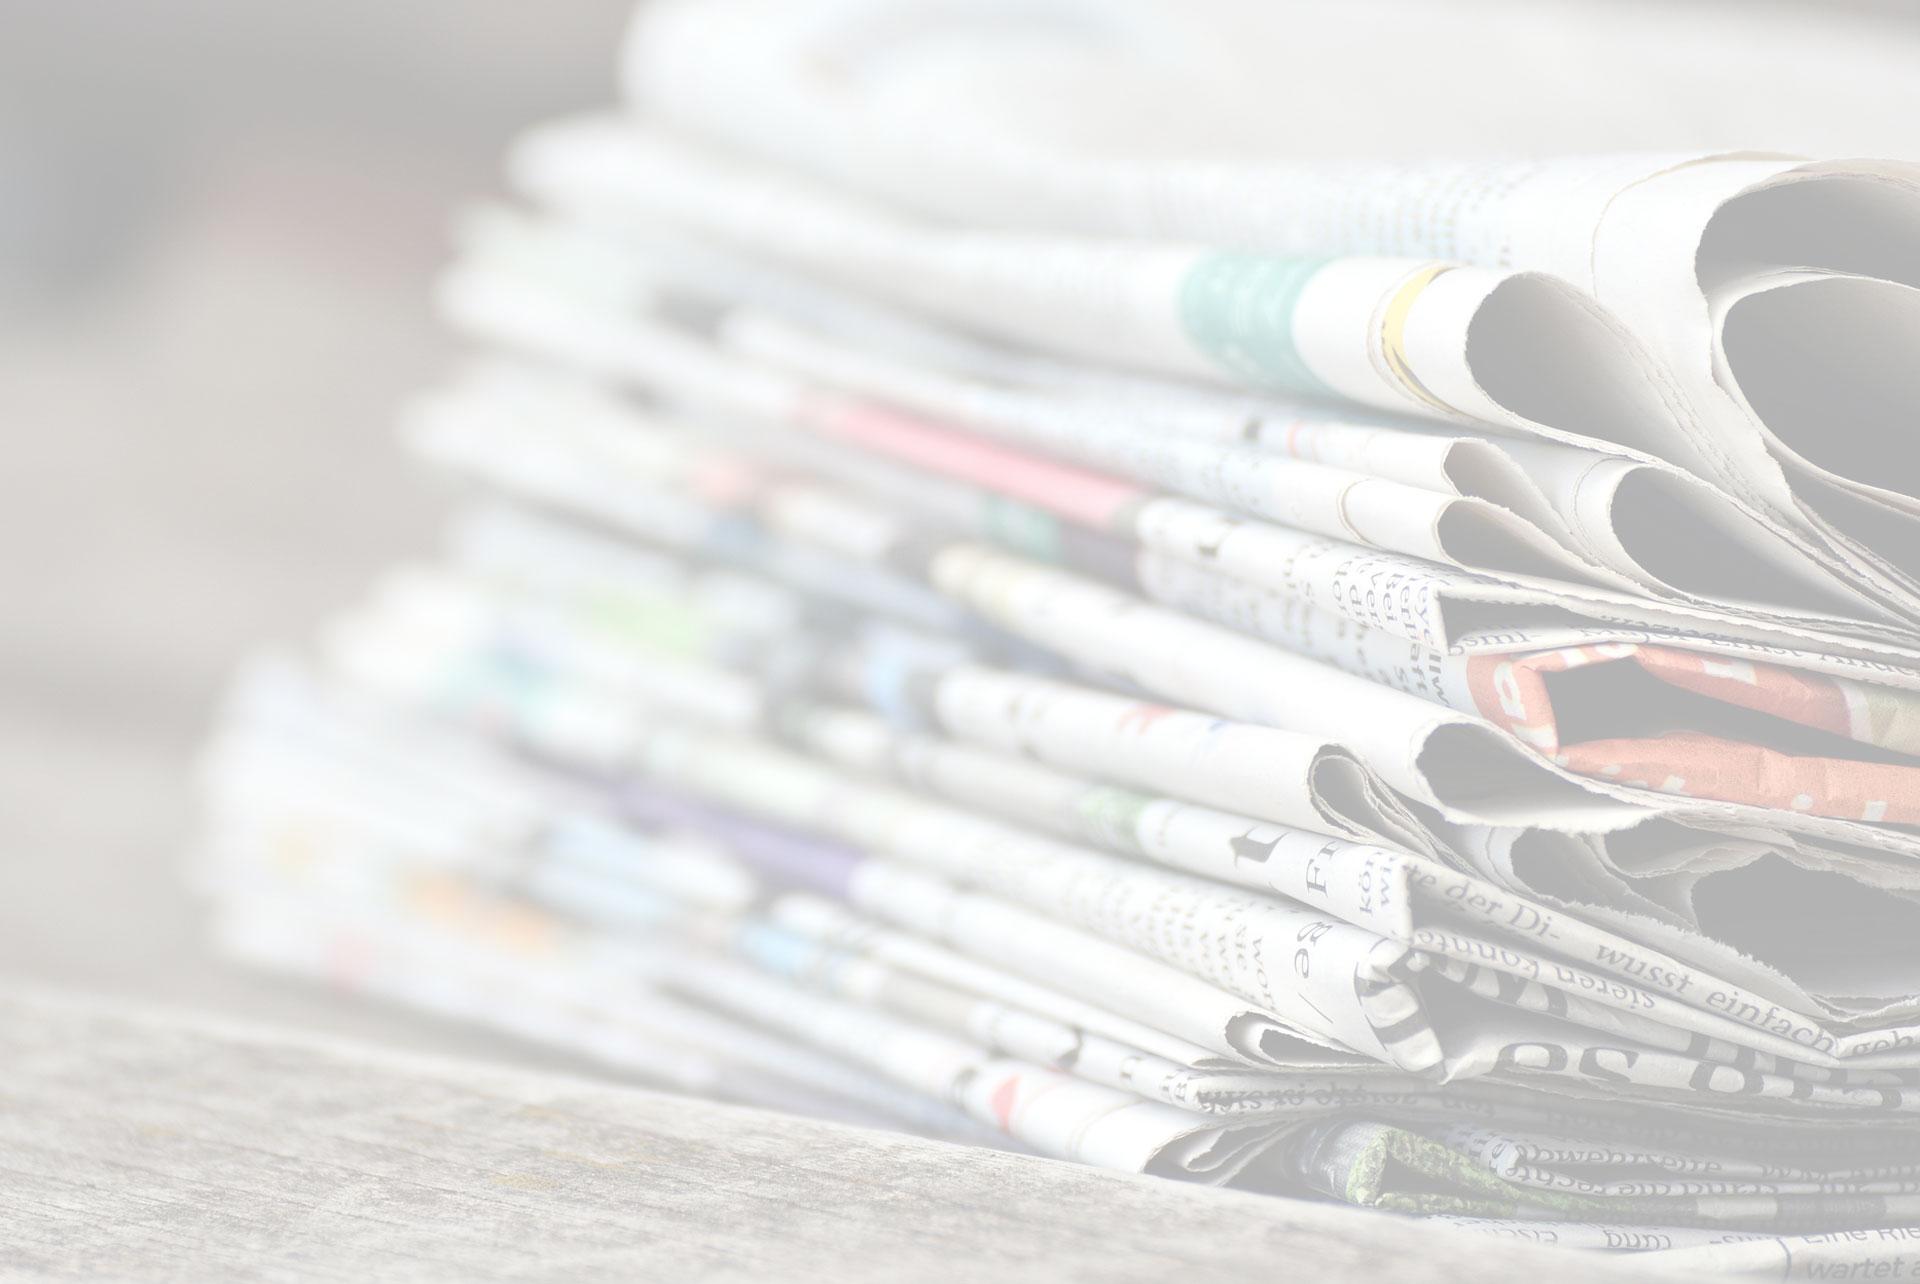 Helena Janeczek